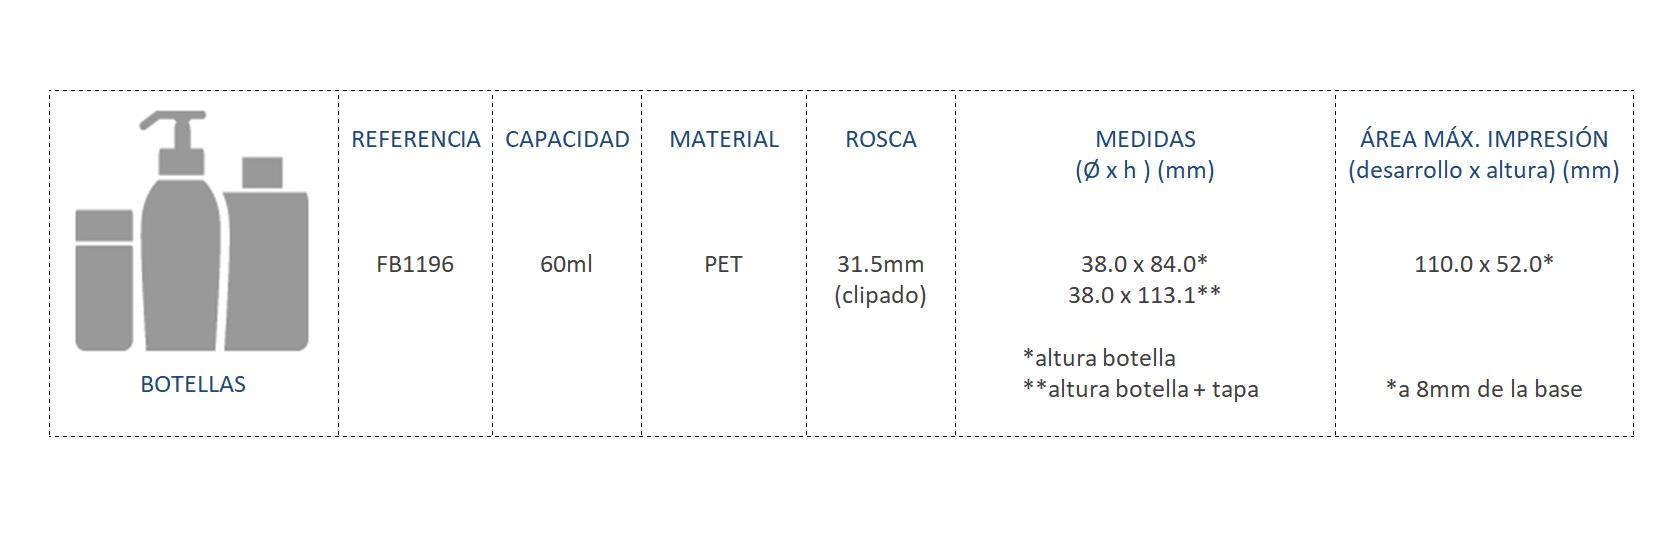 Cuadro de materiales FB1196